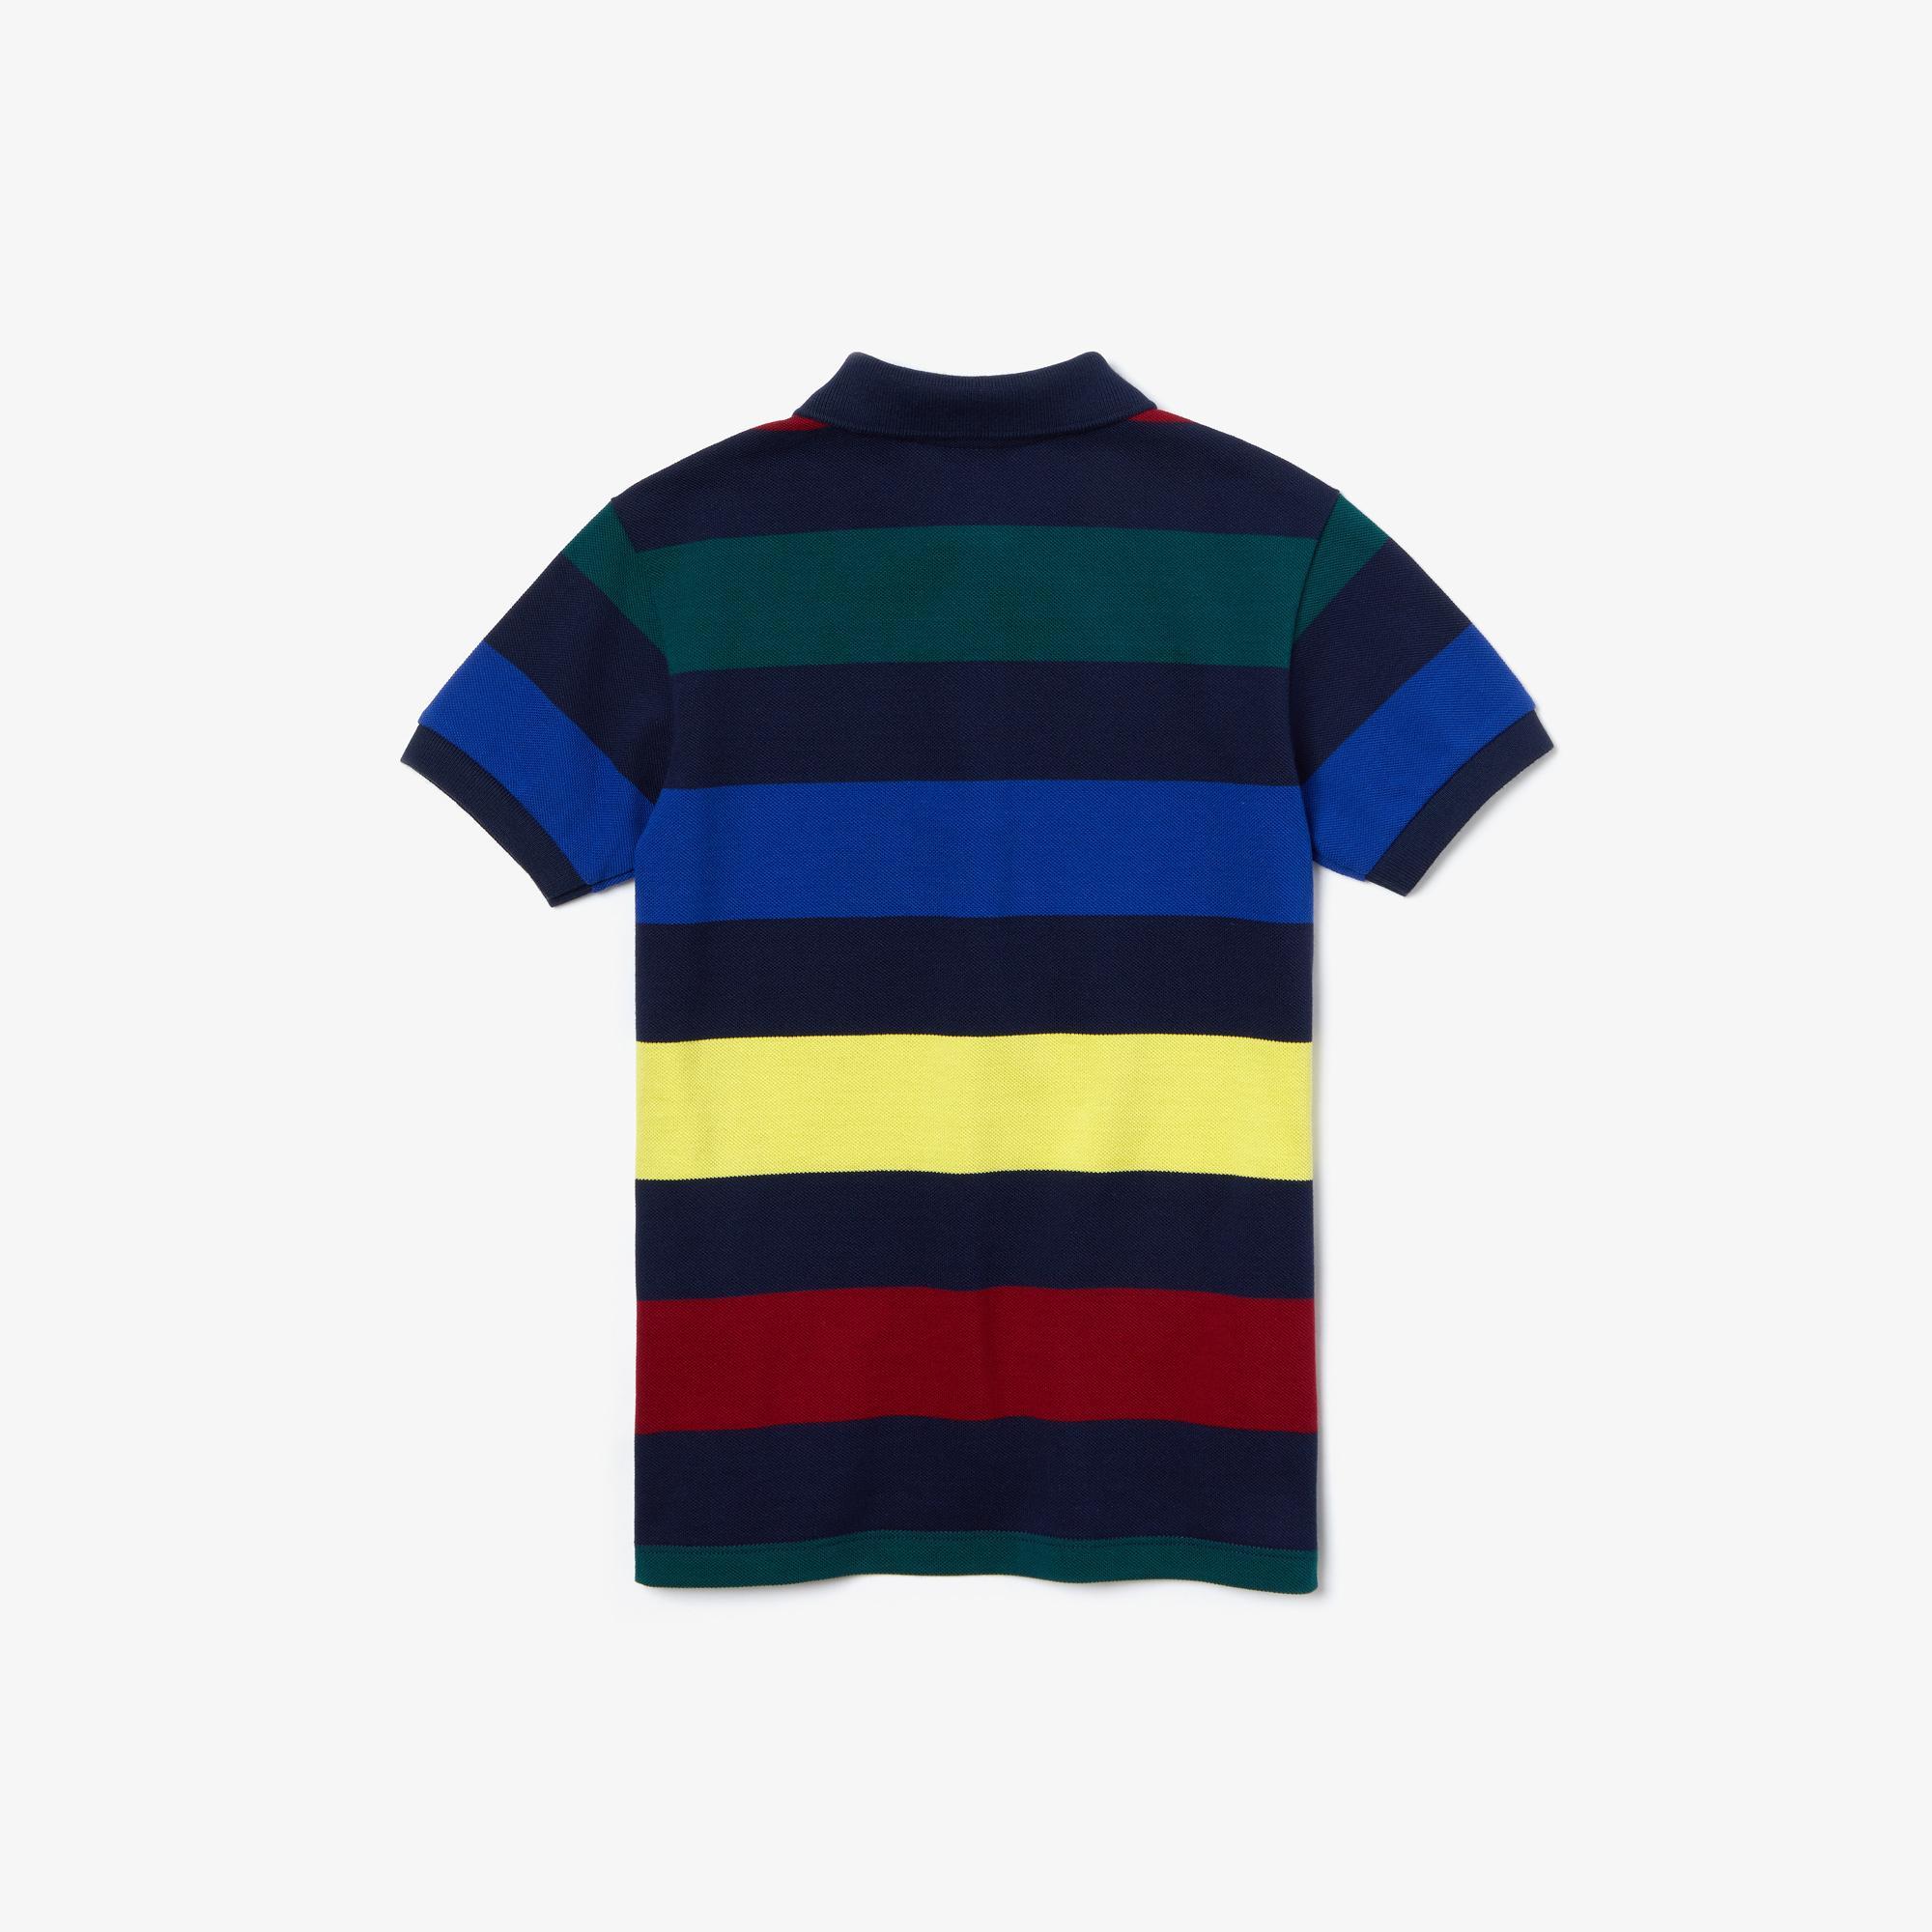 Lacoste Çocuk Blok Desenli Renkli Polo